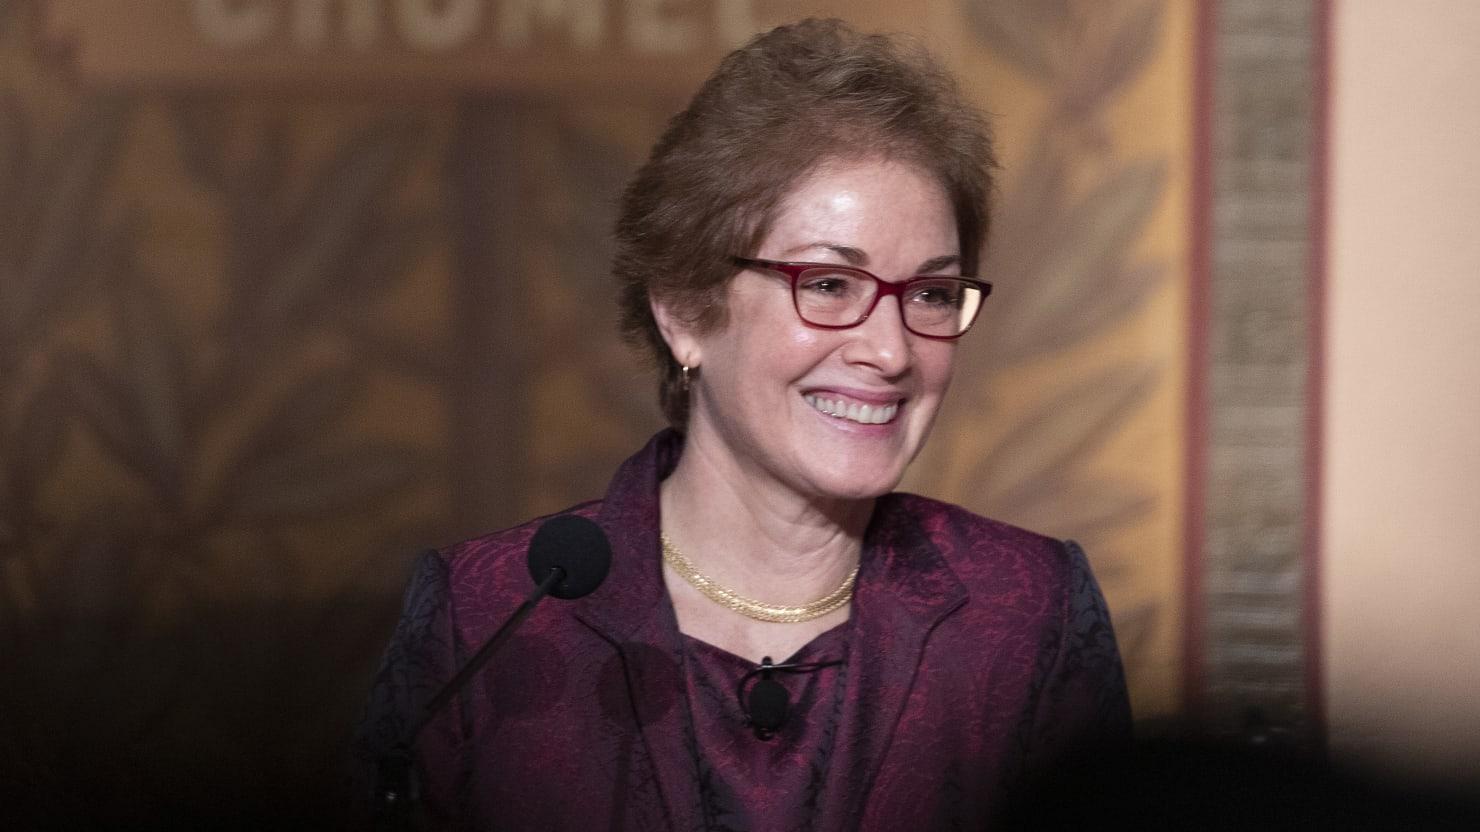 Ex-Ambassador to Ukraine Marie Yovanovitch Nabs Book Deal